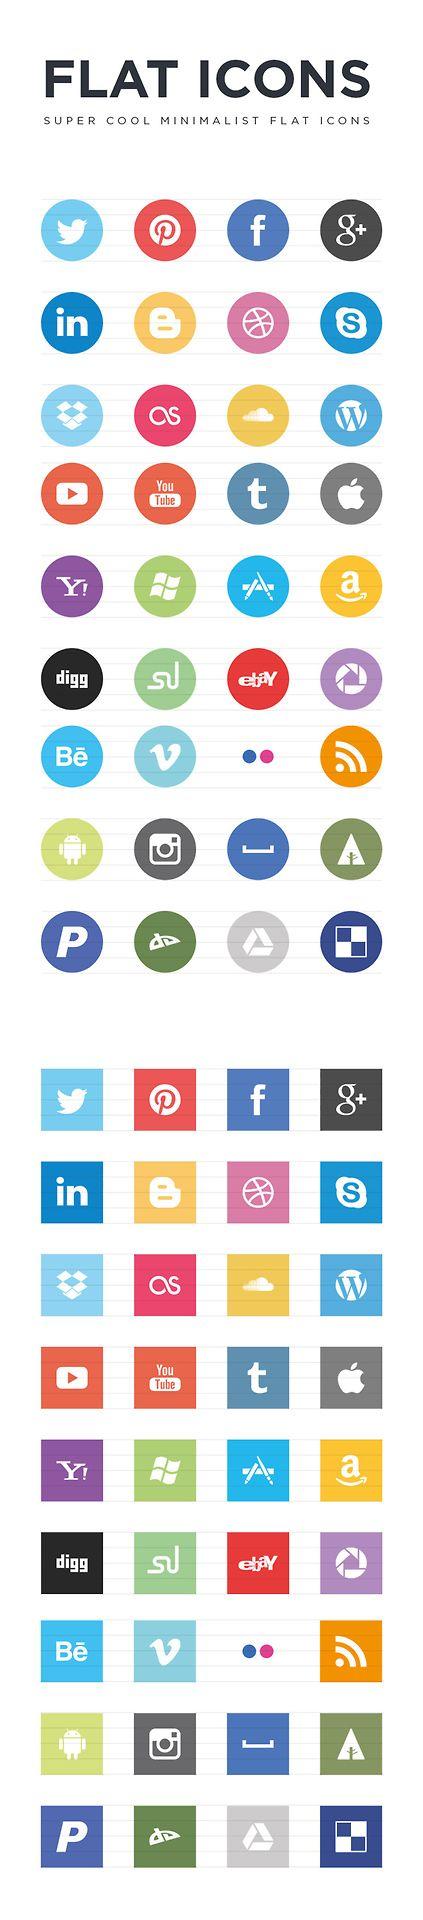 Free Super Cool Minimalist Flat Social Icons via Web Design Freebies